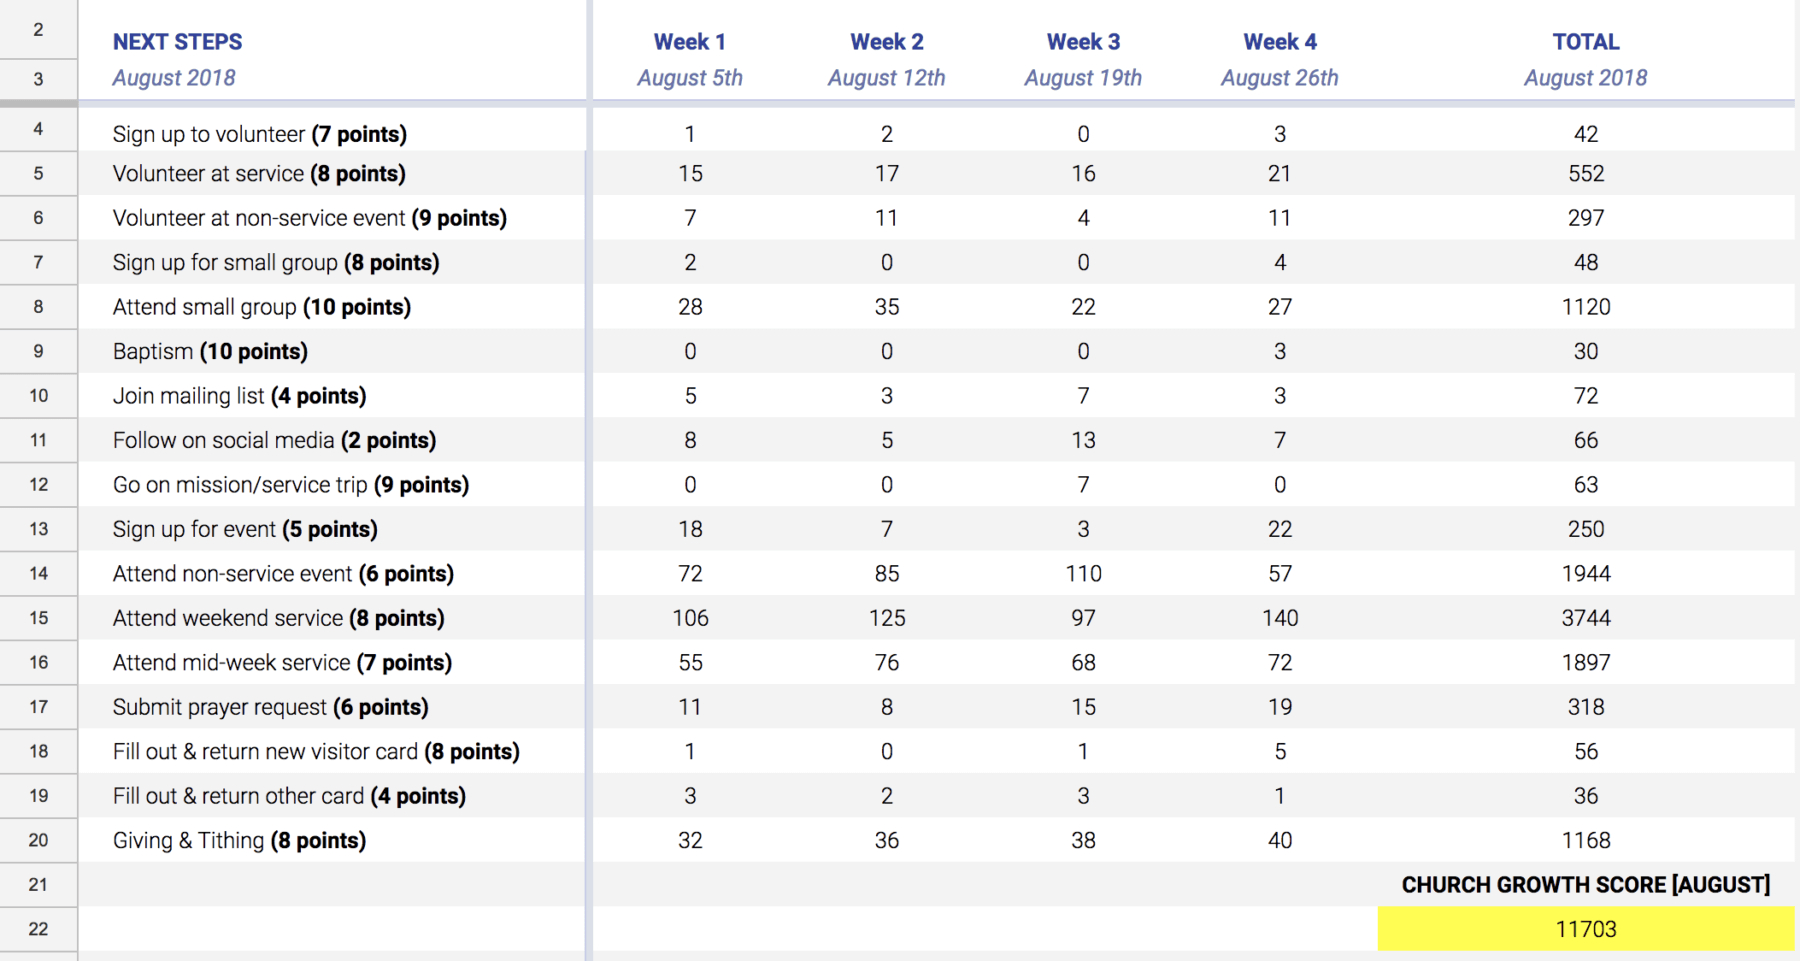 Church Attendance Tracking Spreadsheet | db-excel.com